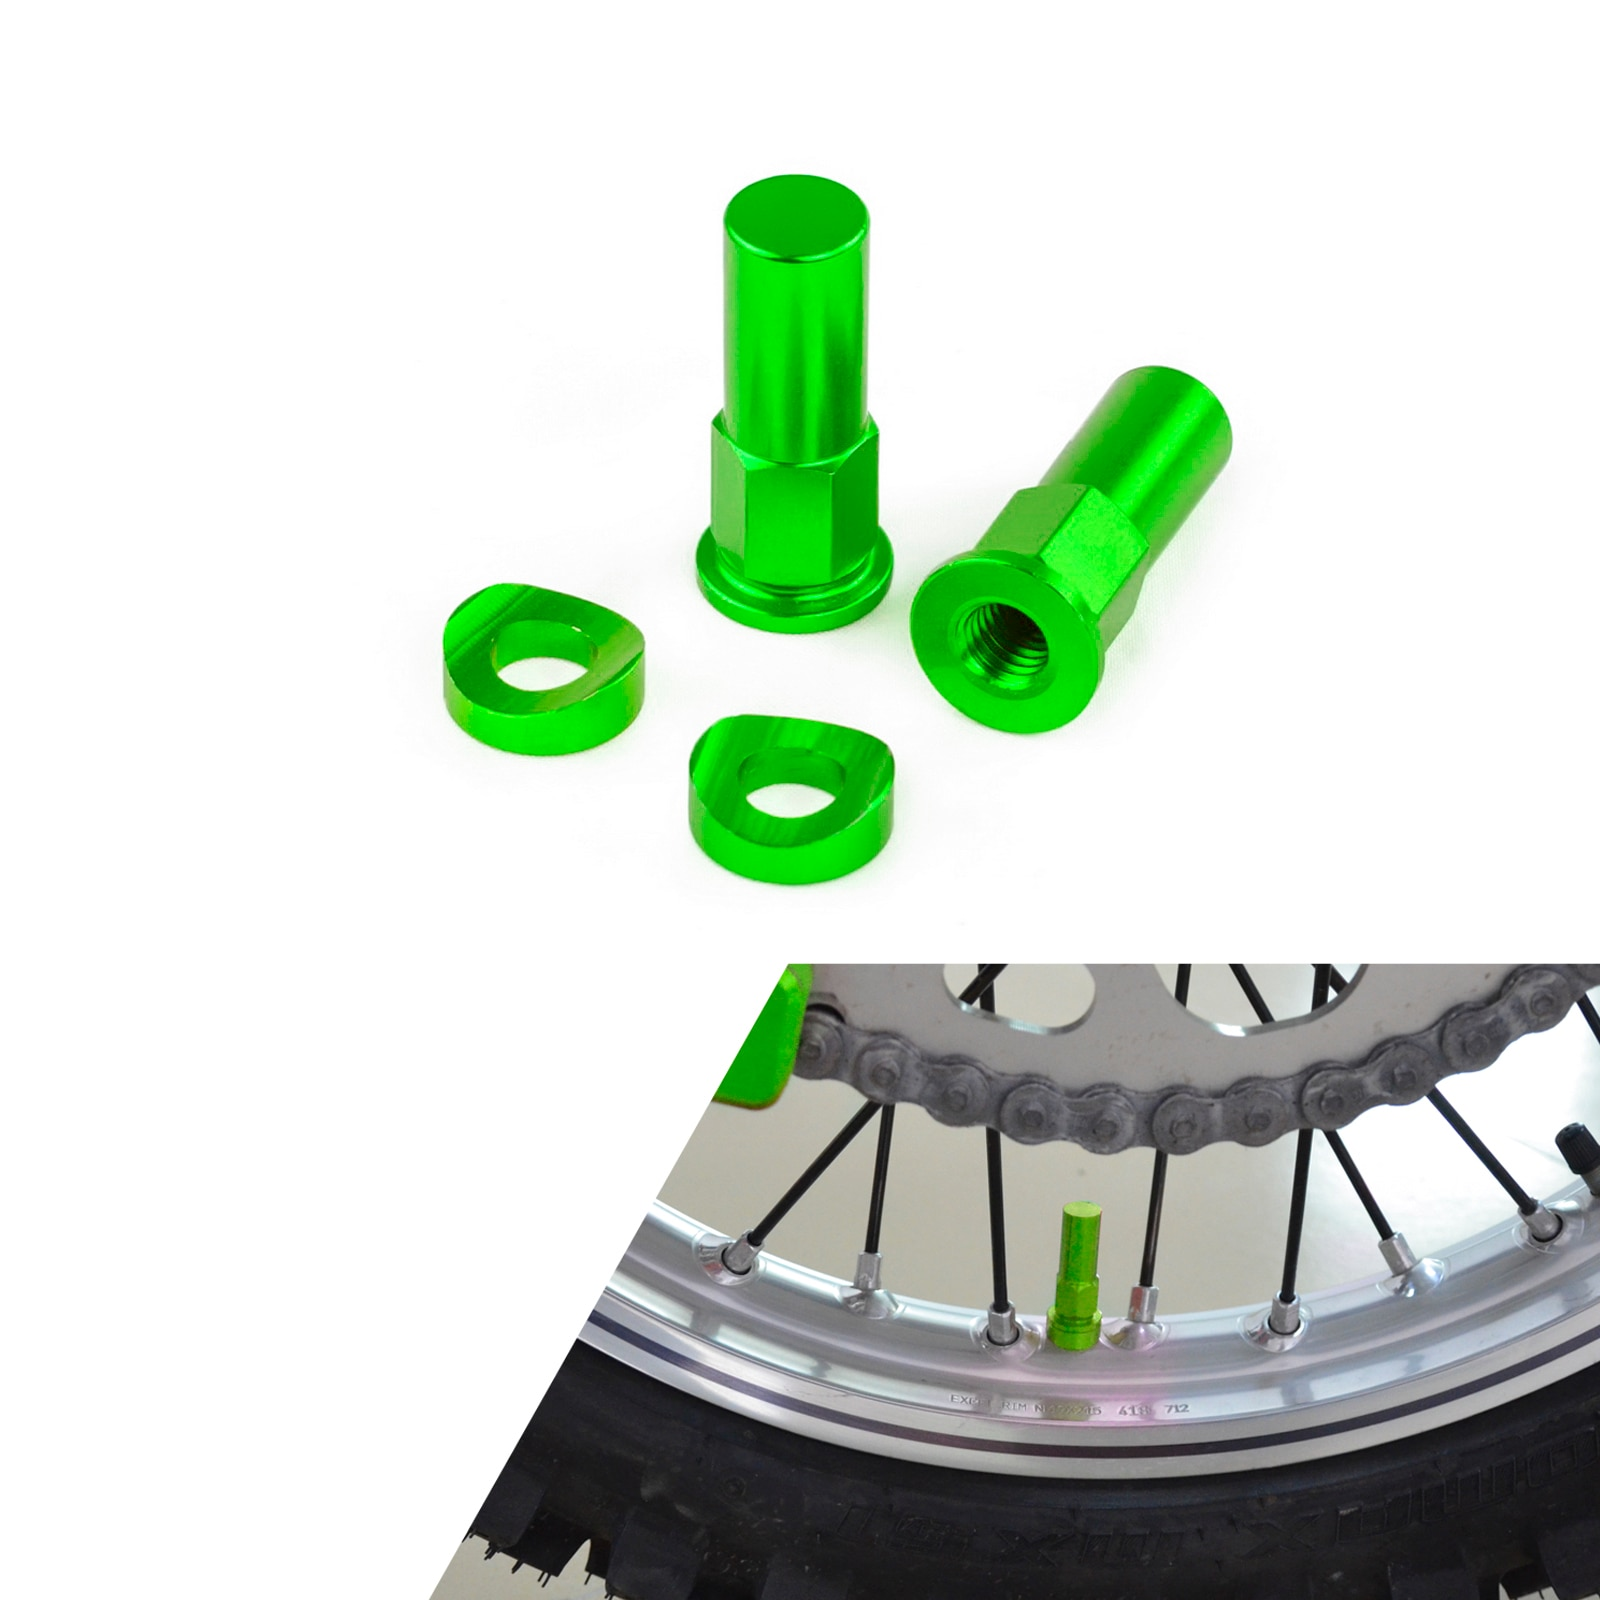 New Motocross Dirt Bike Rim Lock Nut Spacer Kit For CR YZ KX RM CRF YZF KXF RMZ 85 125 250 450